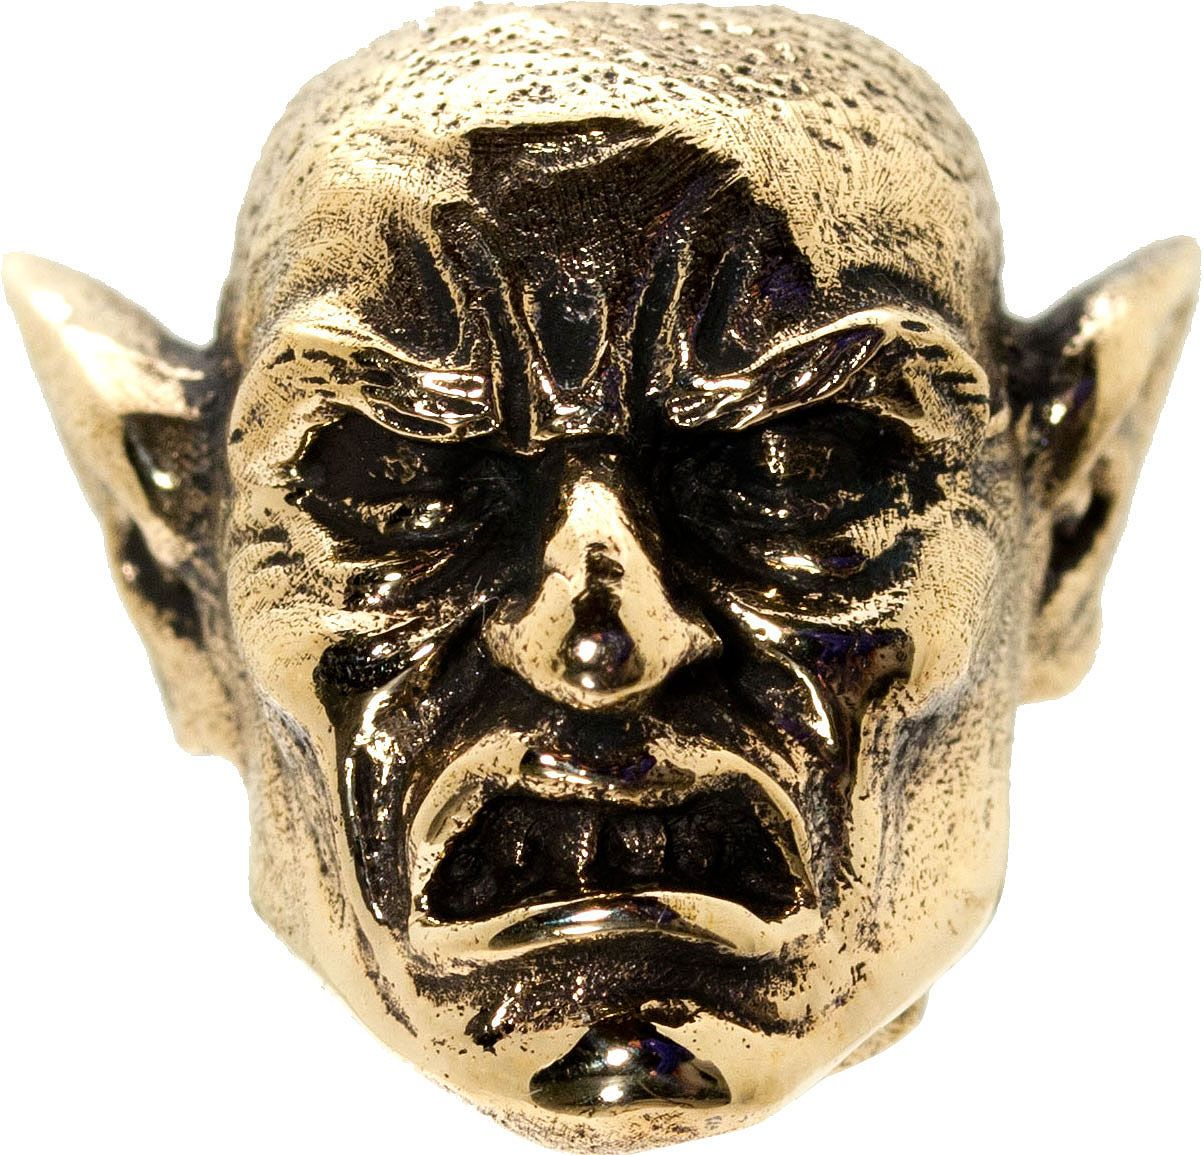 GD Skulls USA Bronze M3 Monsters of the World Elf Bead